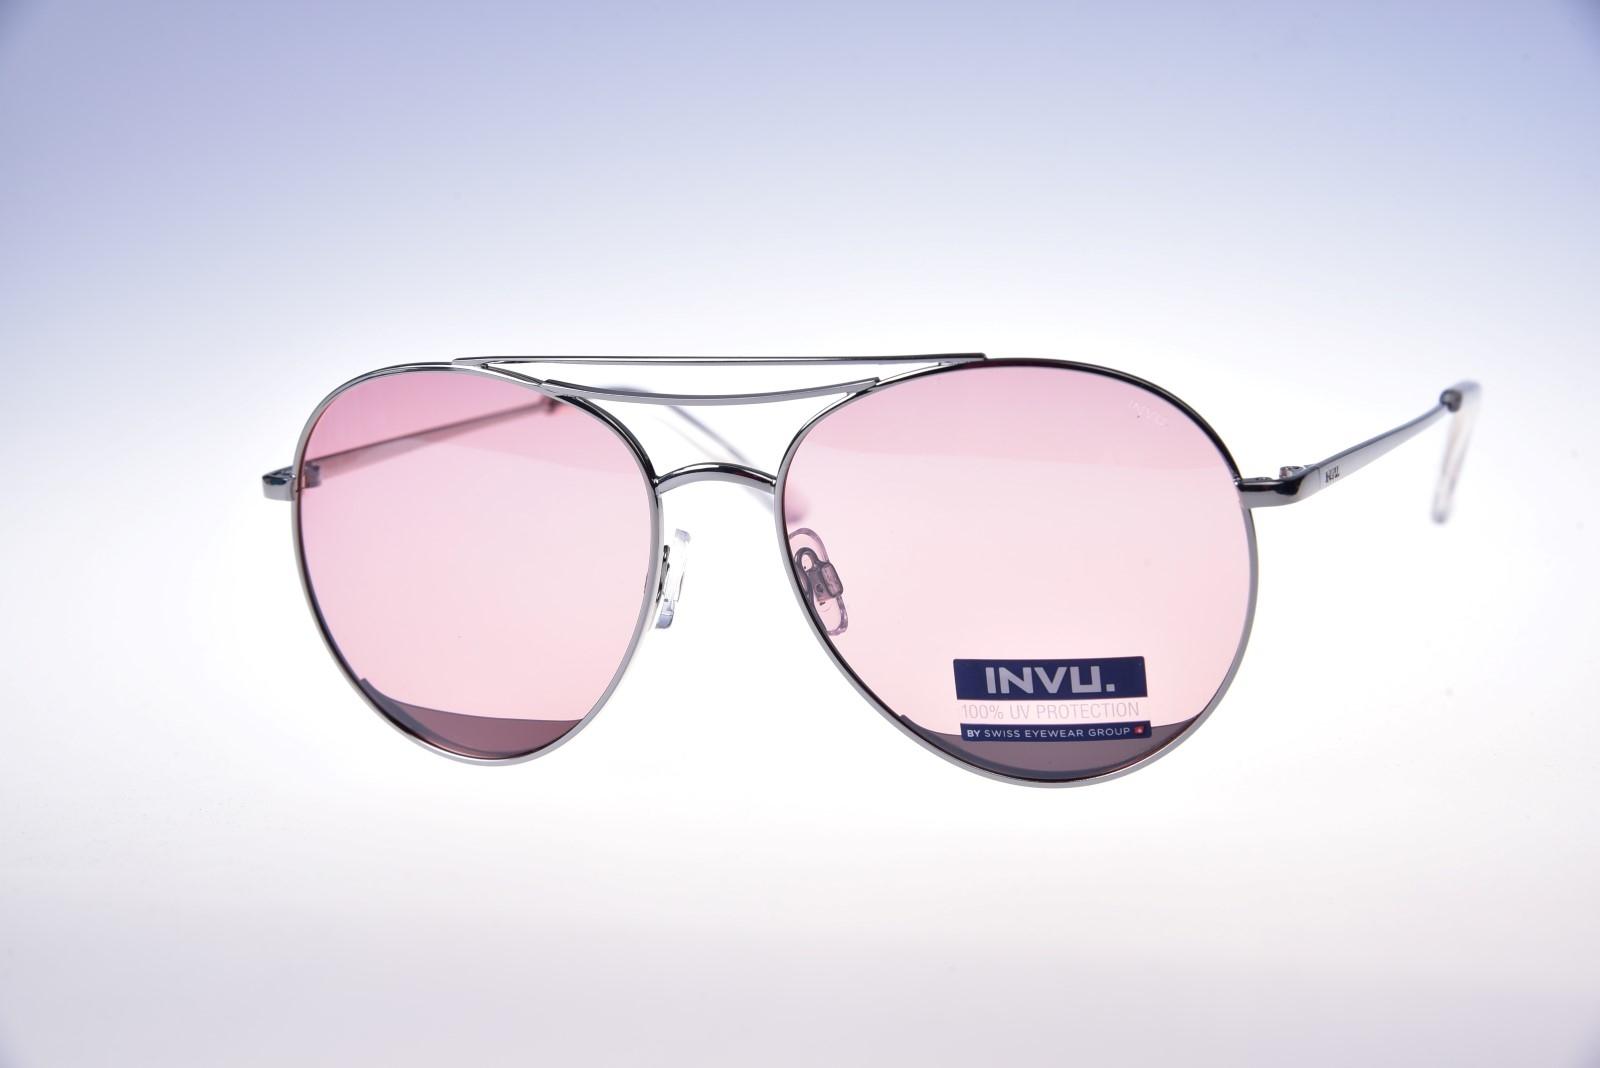 25ce6b892 INVU. Trend T1912C - Dámske, pánske a detské slnečné okuliare ...